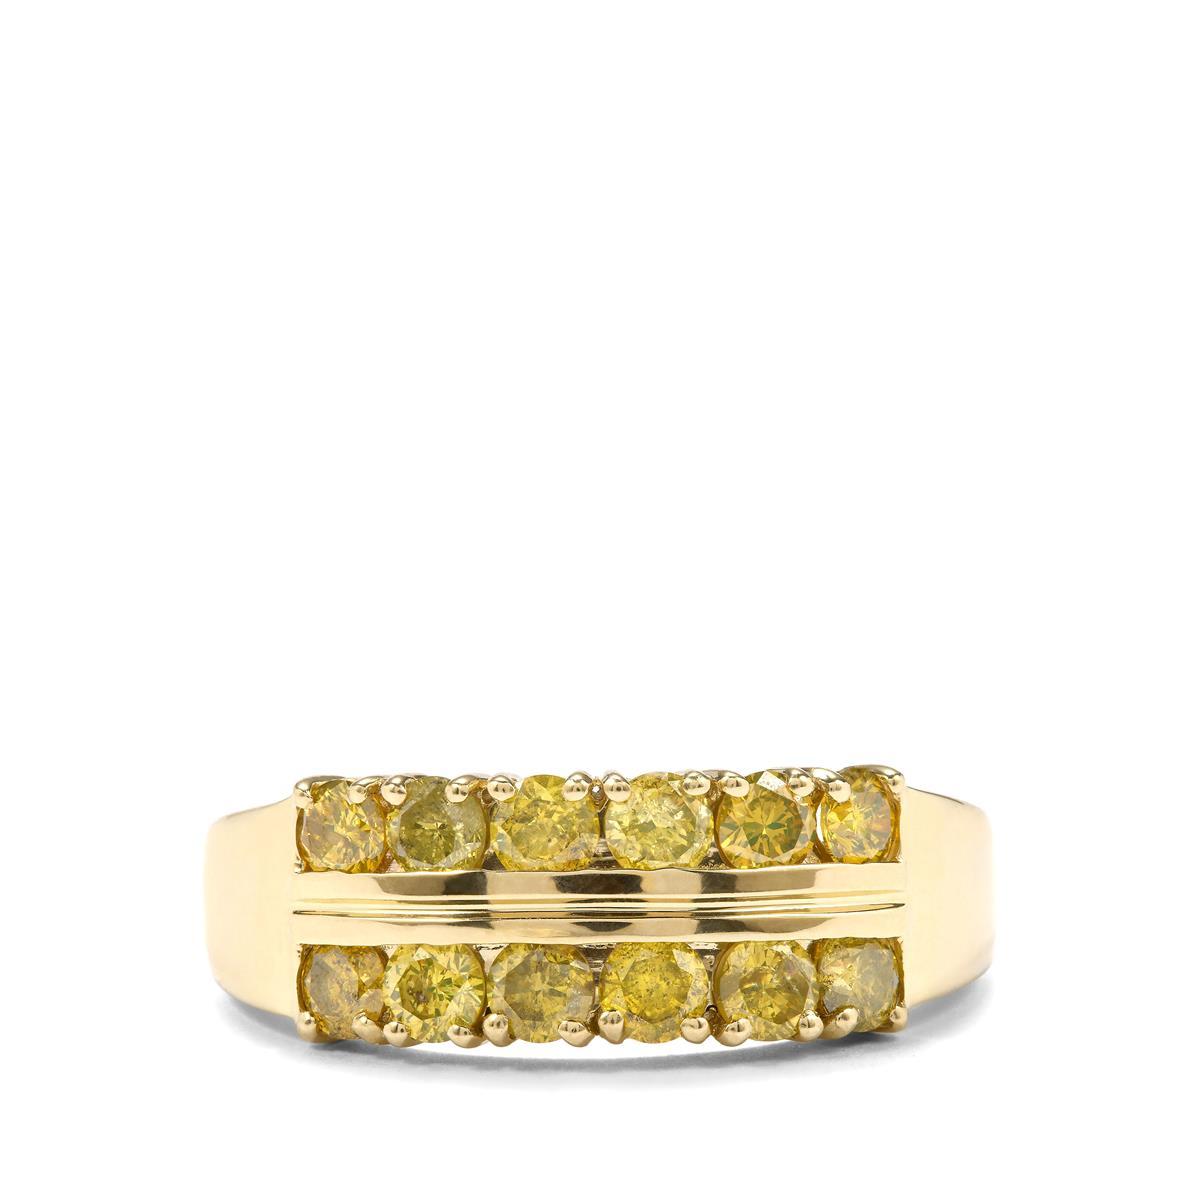 Diamond Yellow 05ctsHbeq35 Gemporia 1 Ring Gold 9k In 1F3lcTKJ